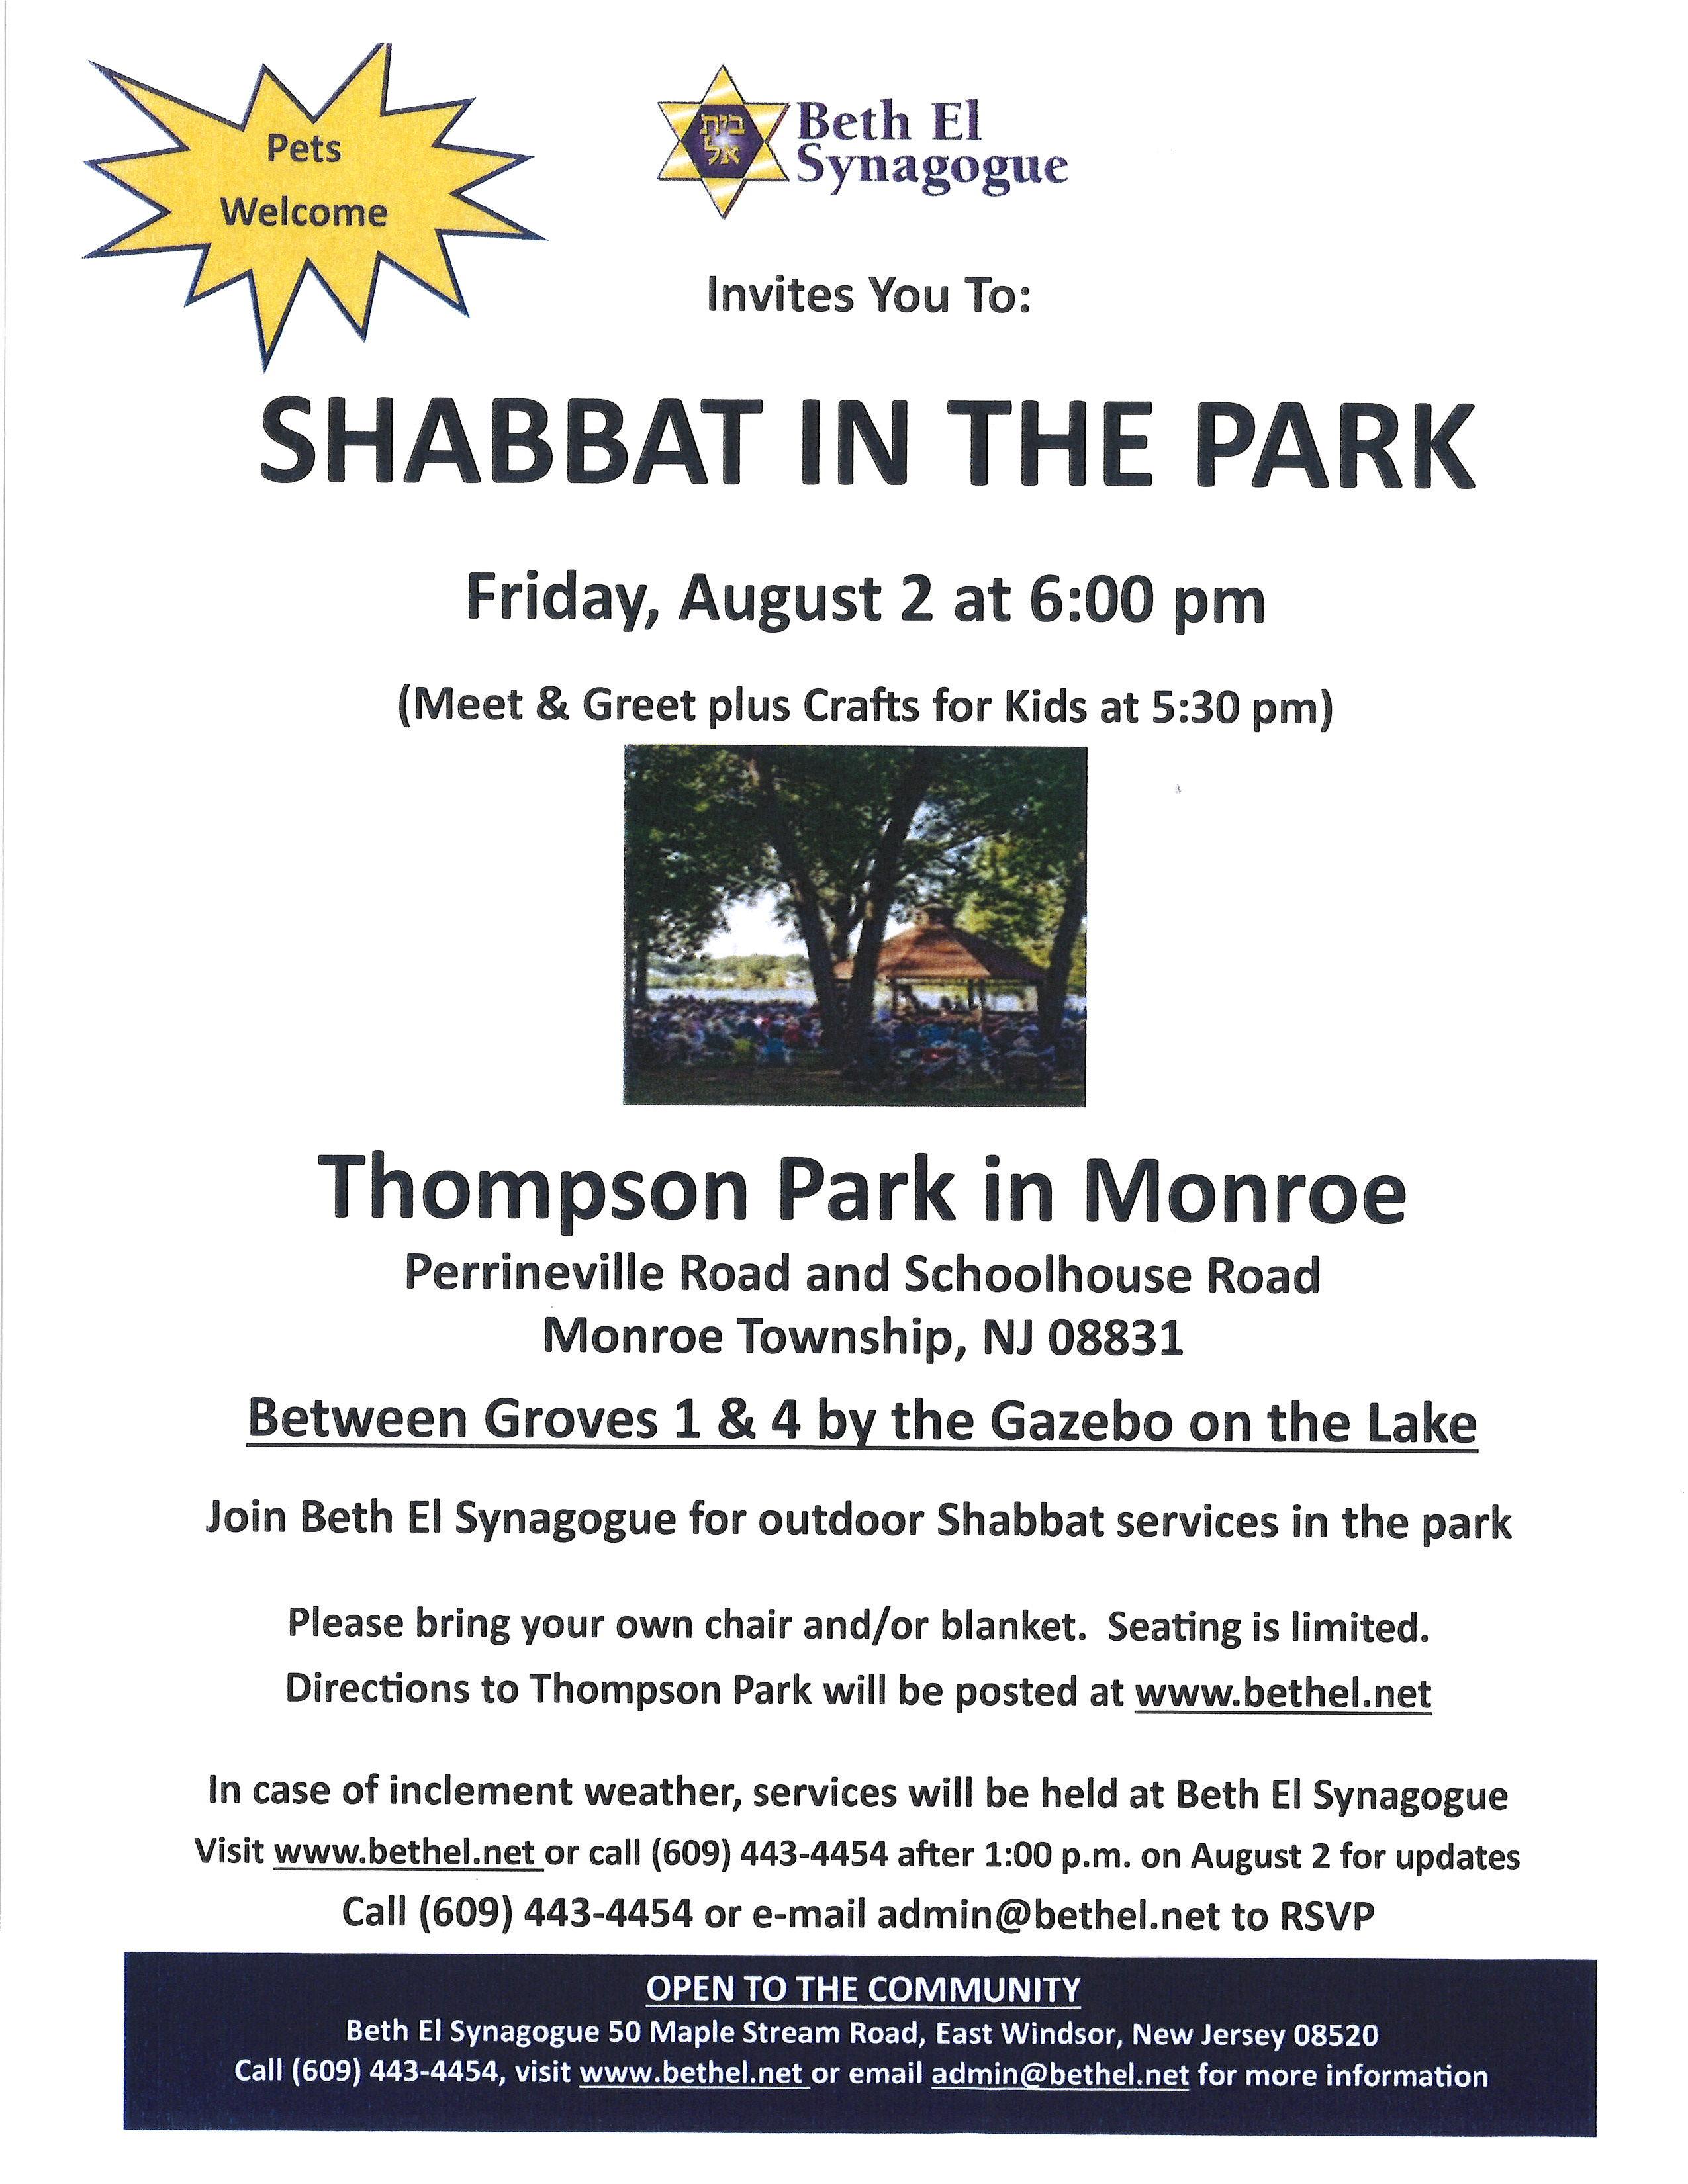 8.2.19-Shabbat-in-the-Park-Monroe